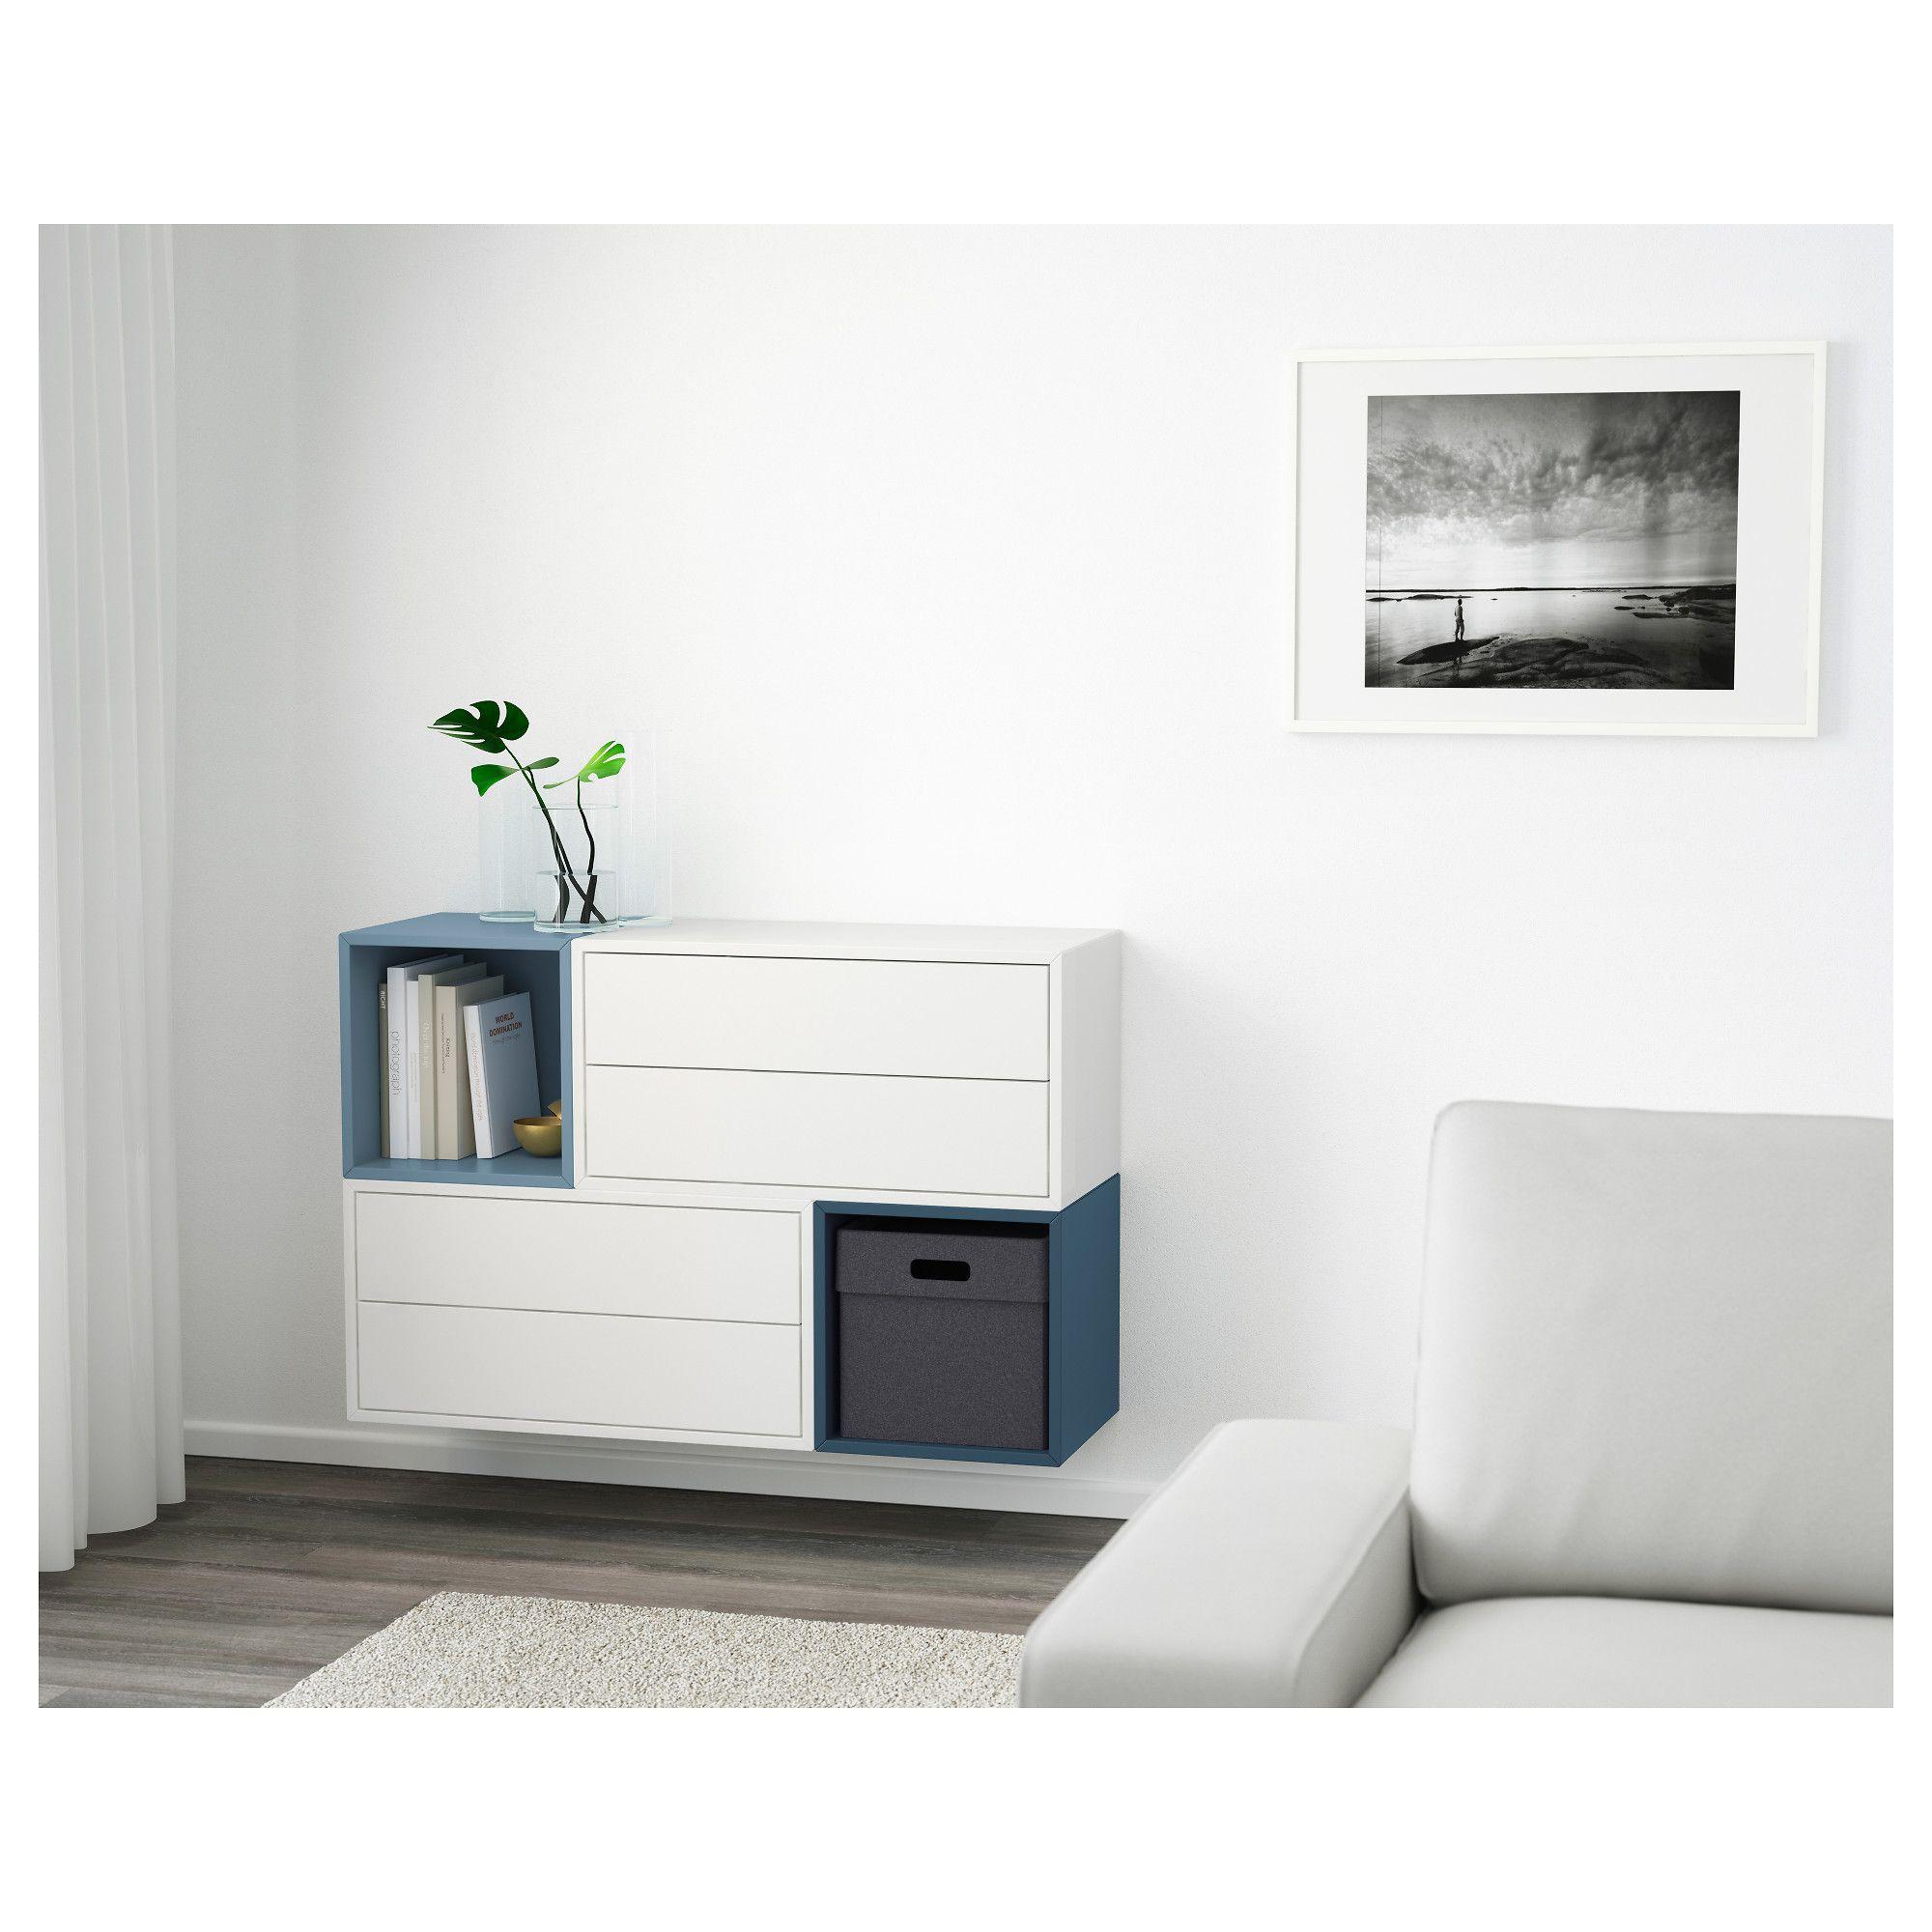 Furniture and Home Furnishings Arredamento ingresso casa